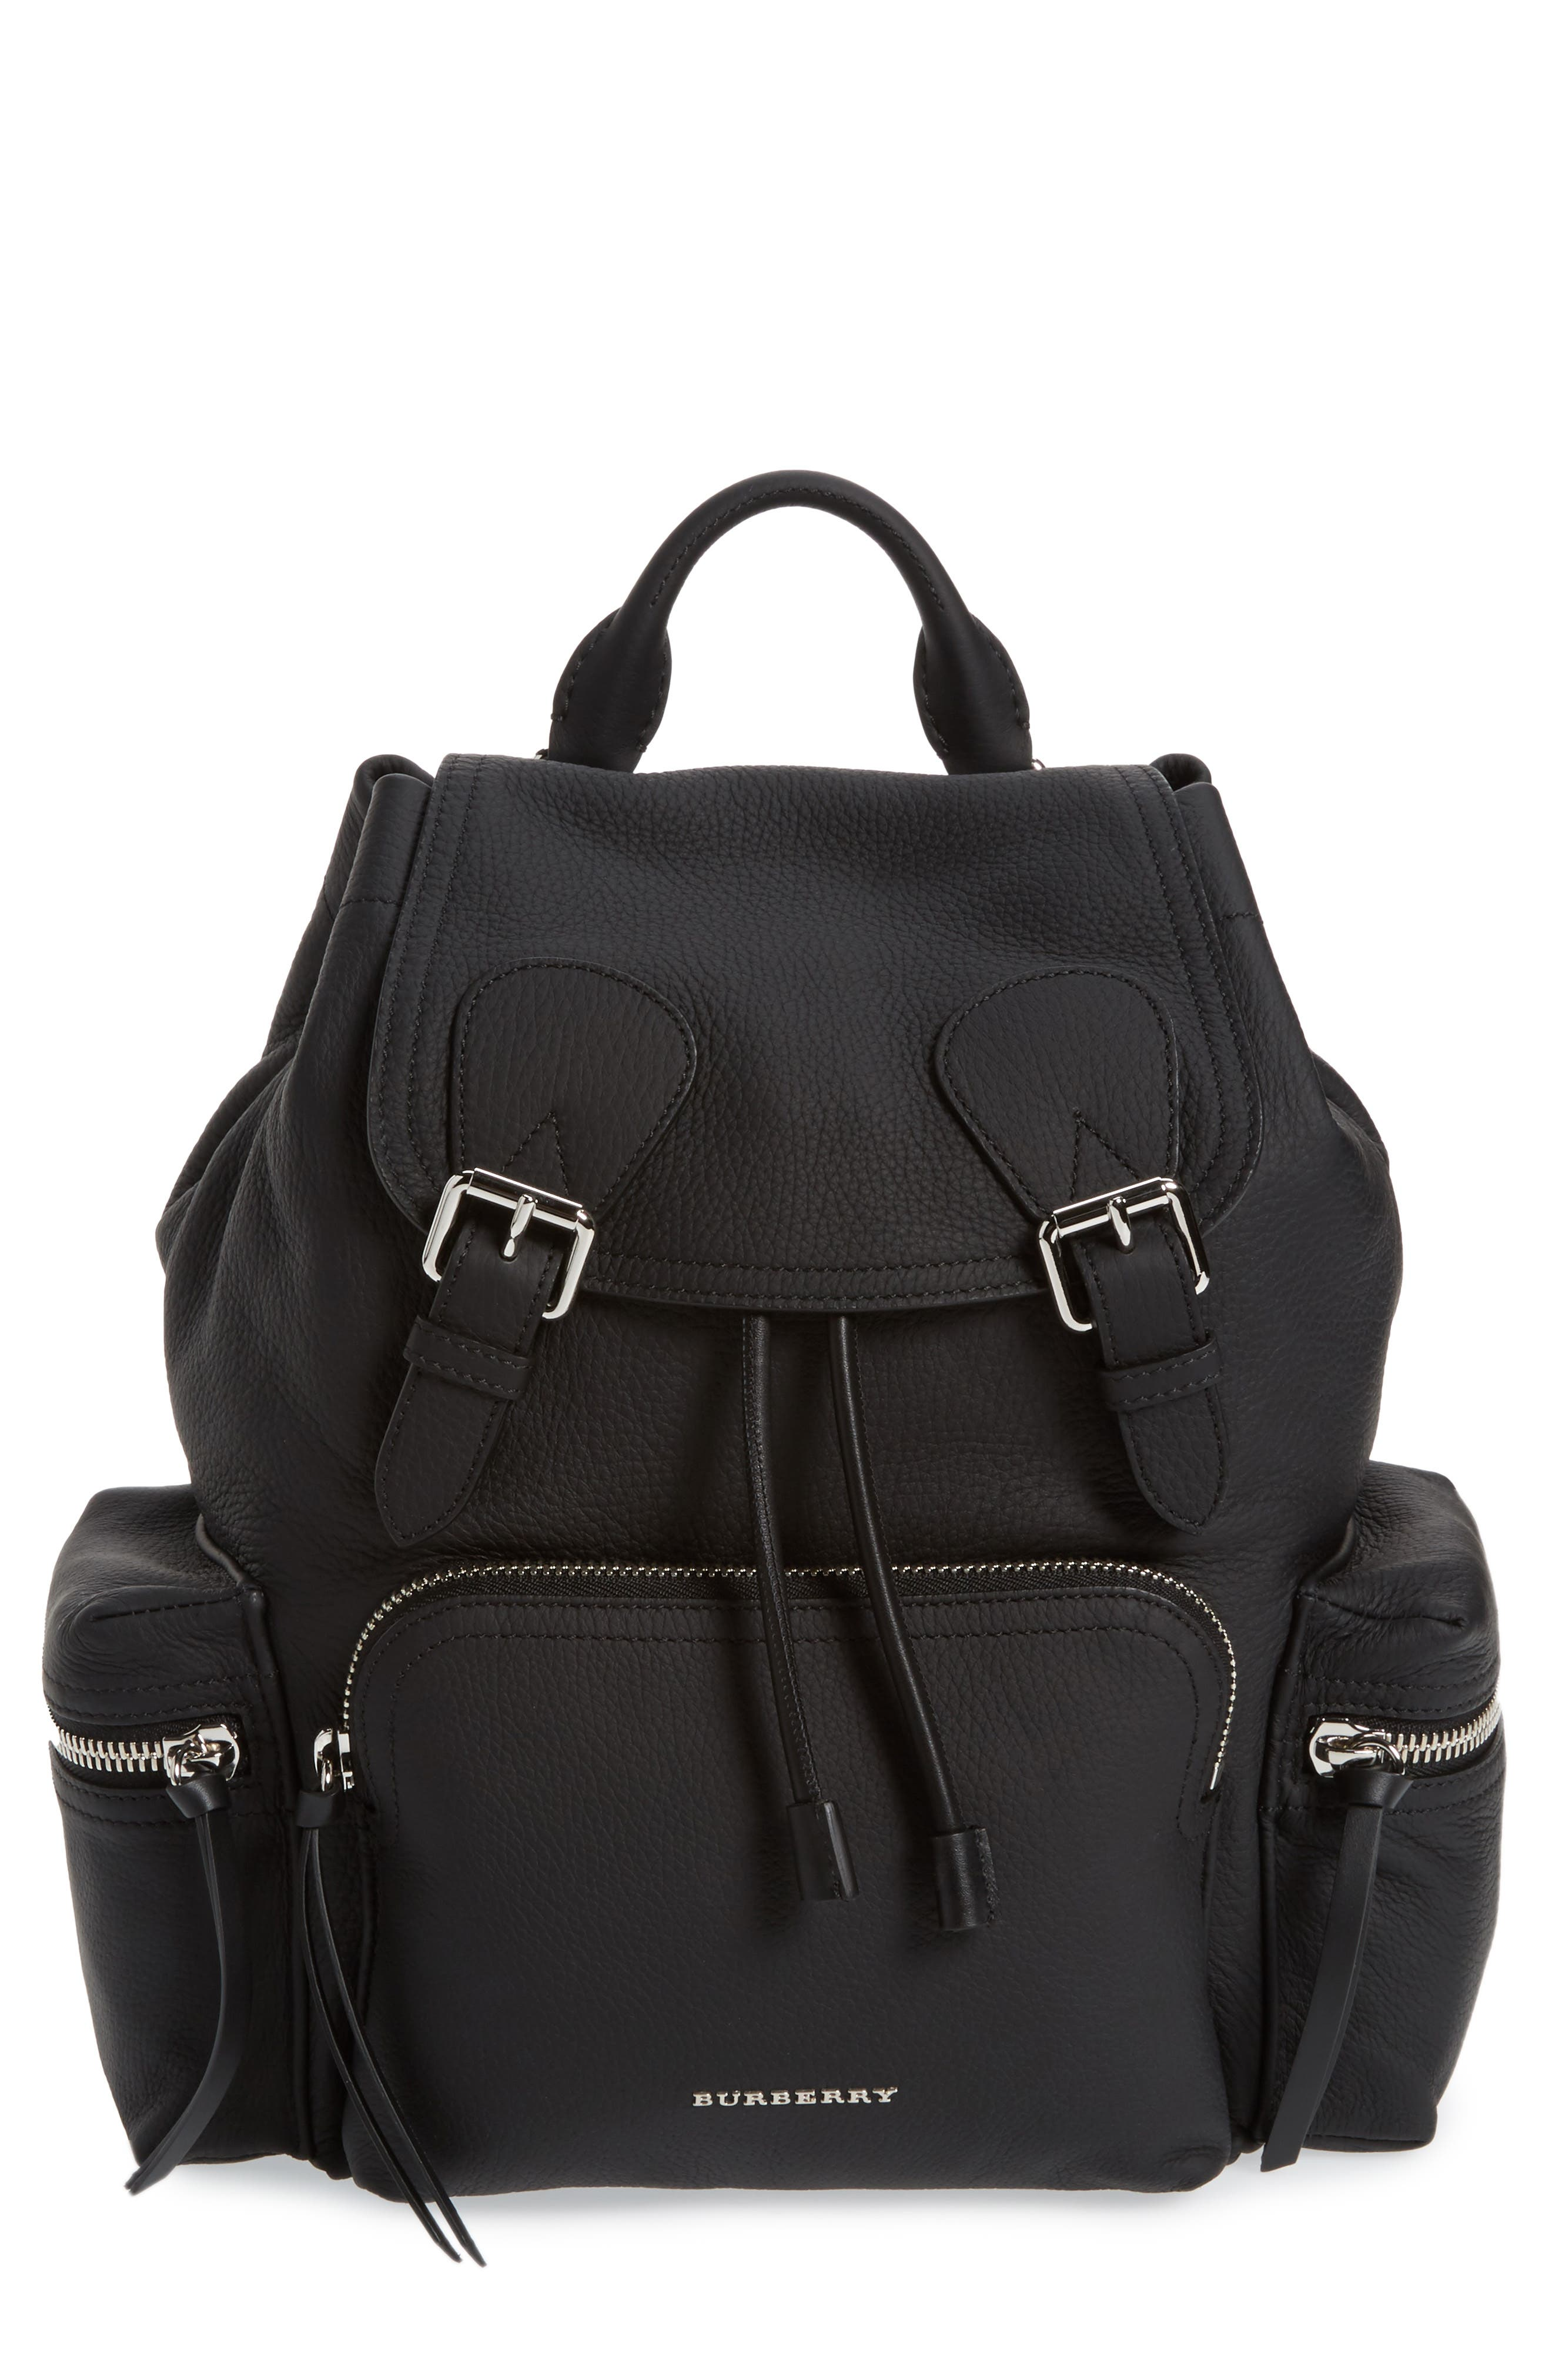 Burberry Medium Rucksack Leather Backpack